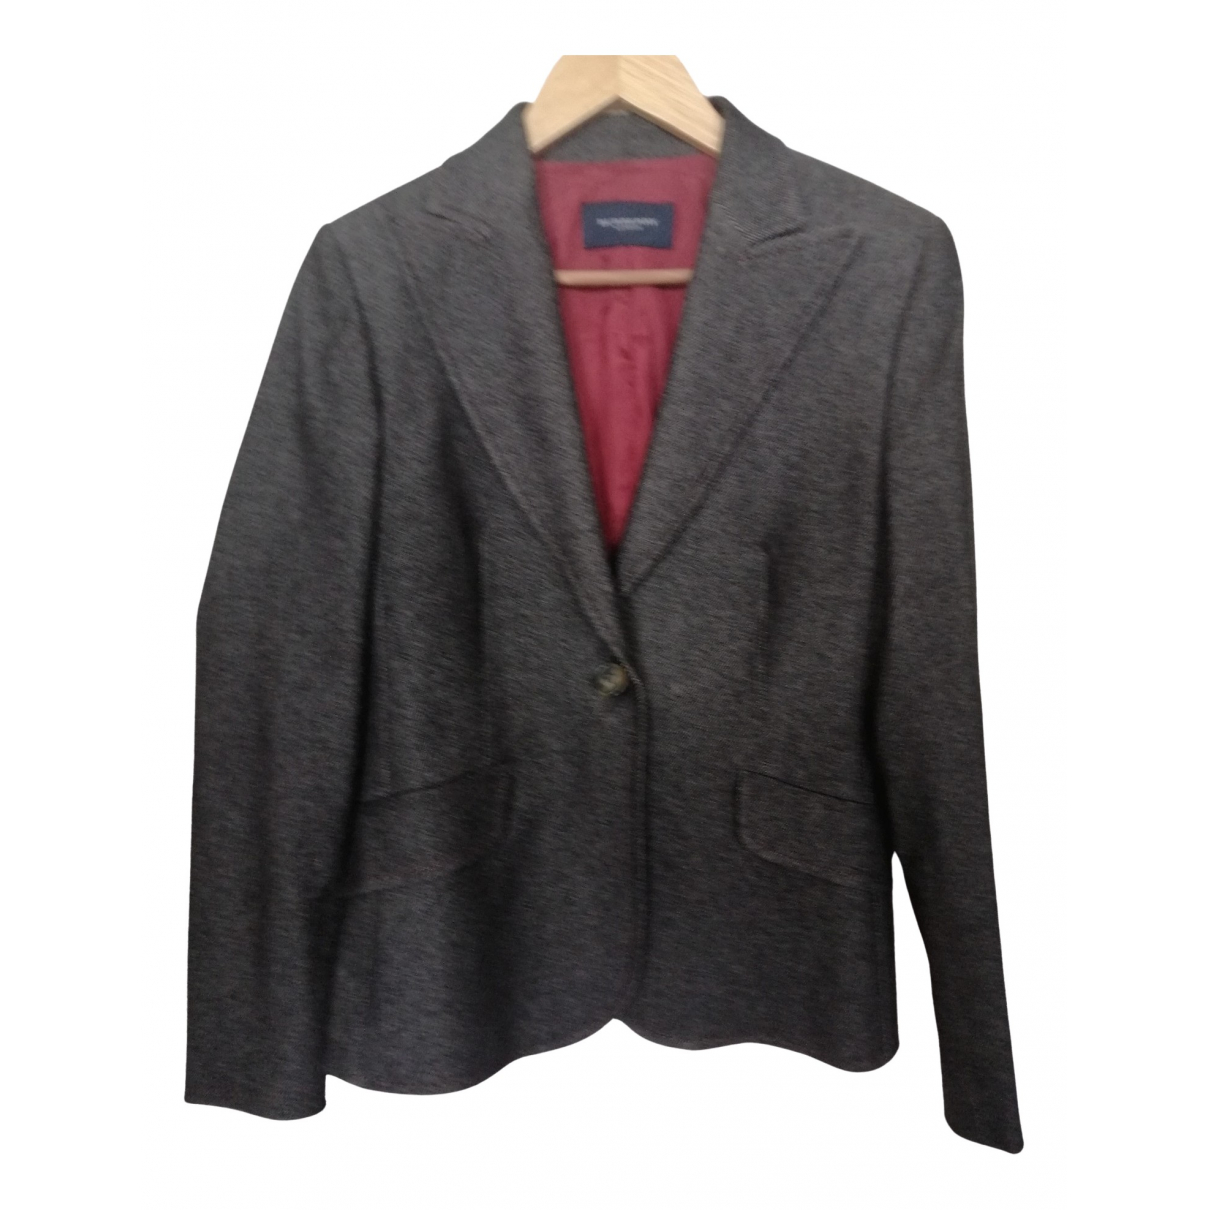 Burberry \N Jacke in  Grau Wolle